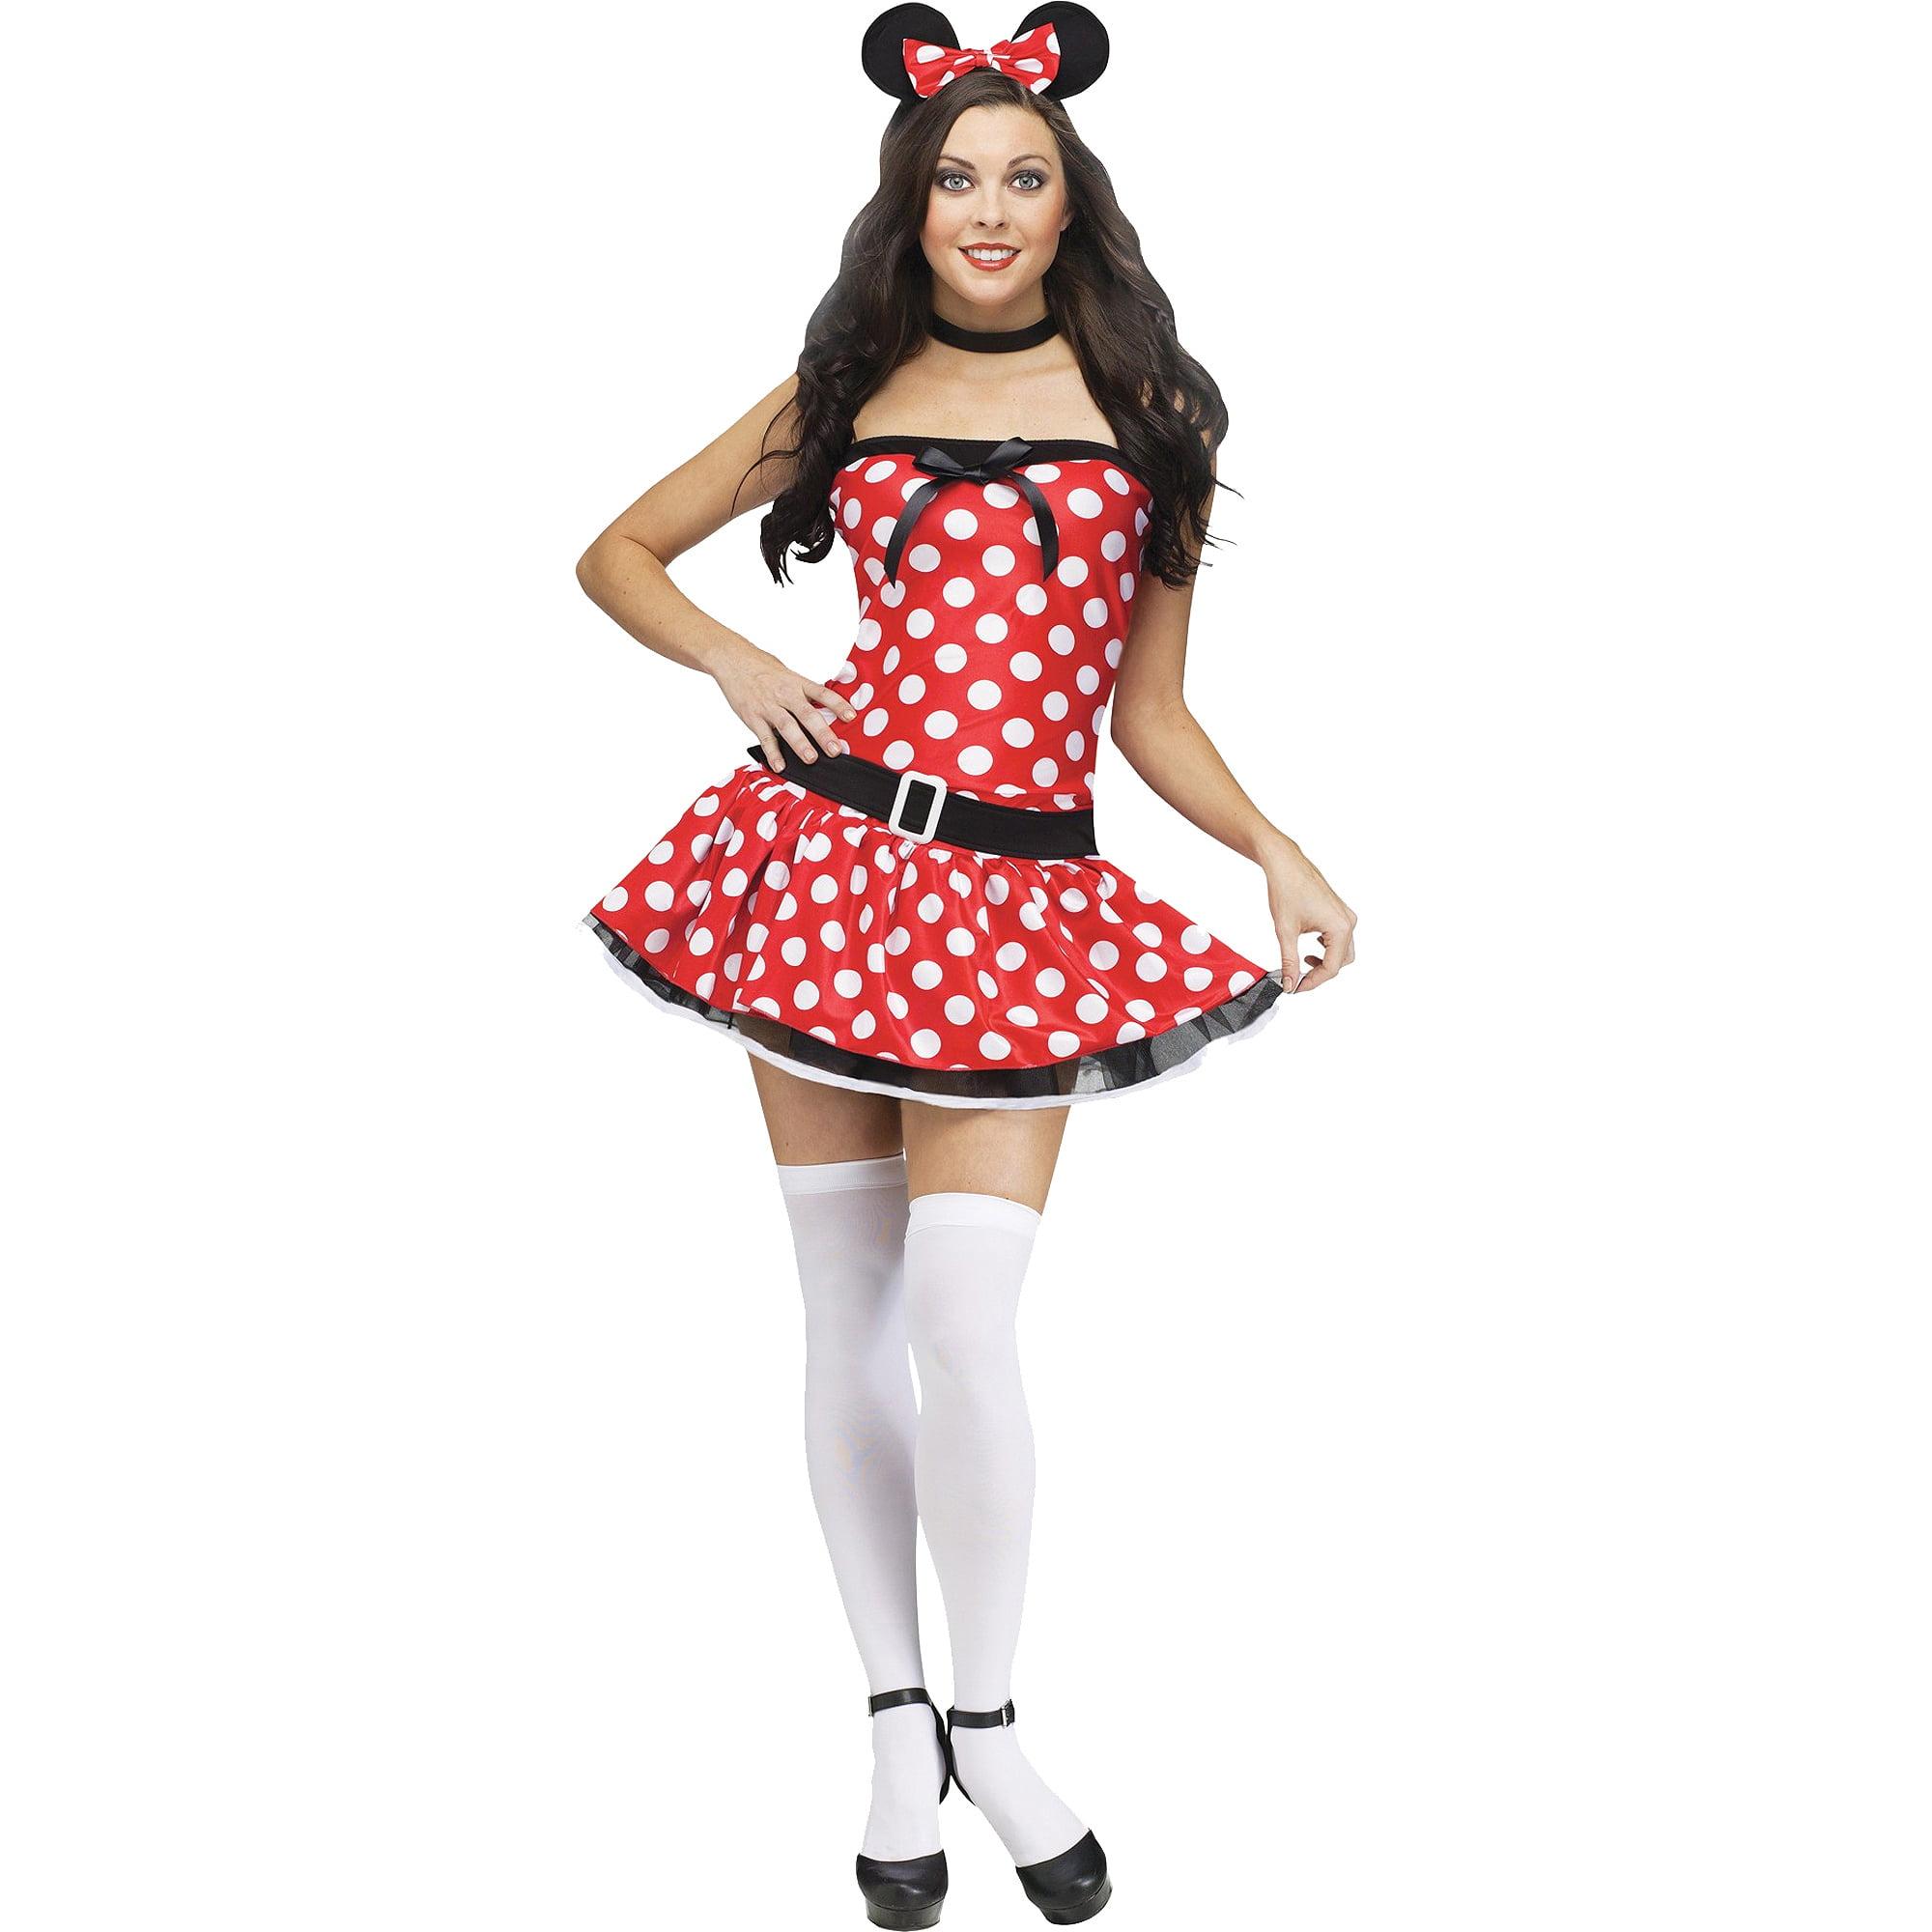 Mousie Adult Halloween Costume